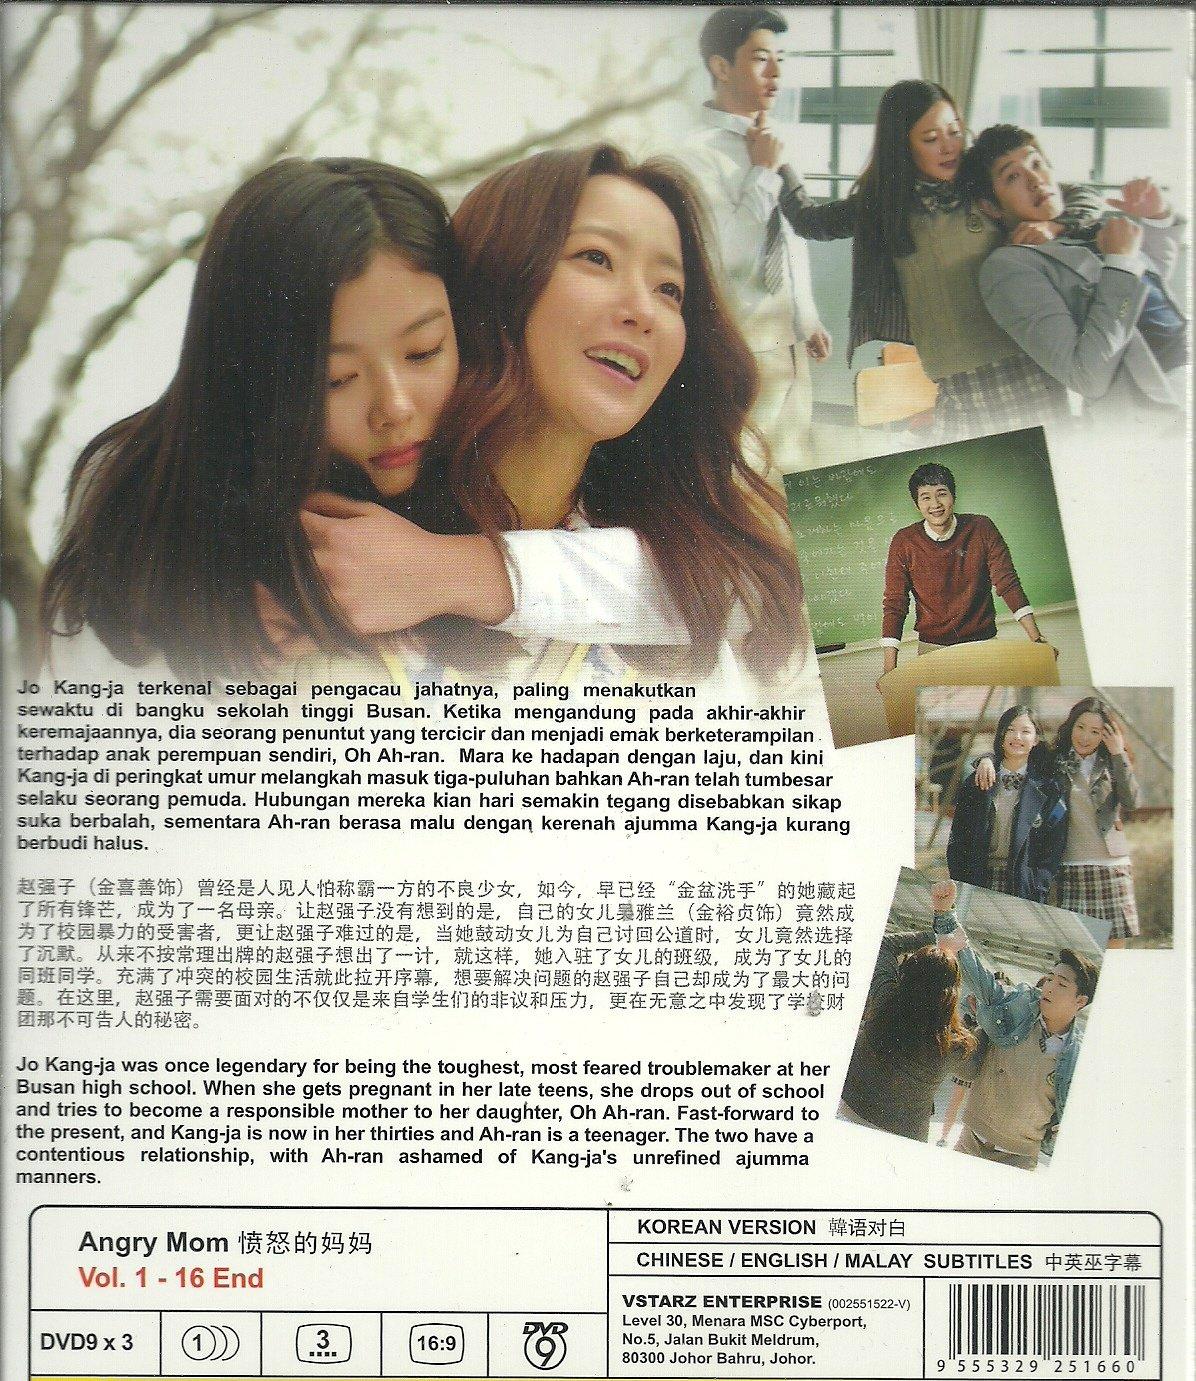 Amazon com: ANGRY MOM - COMPLETE KOREAN TV SERIES ( 1-16